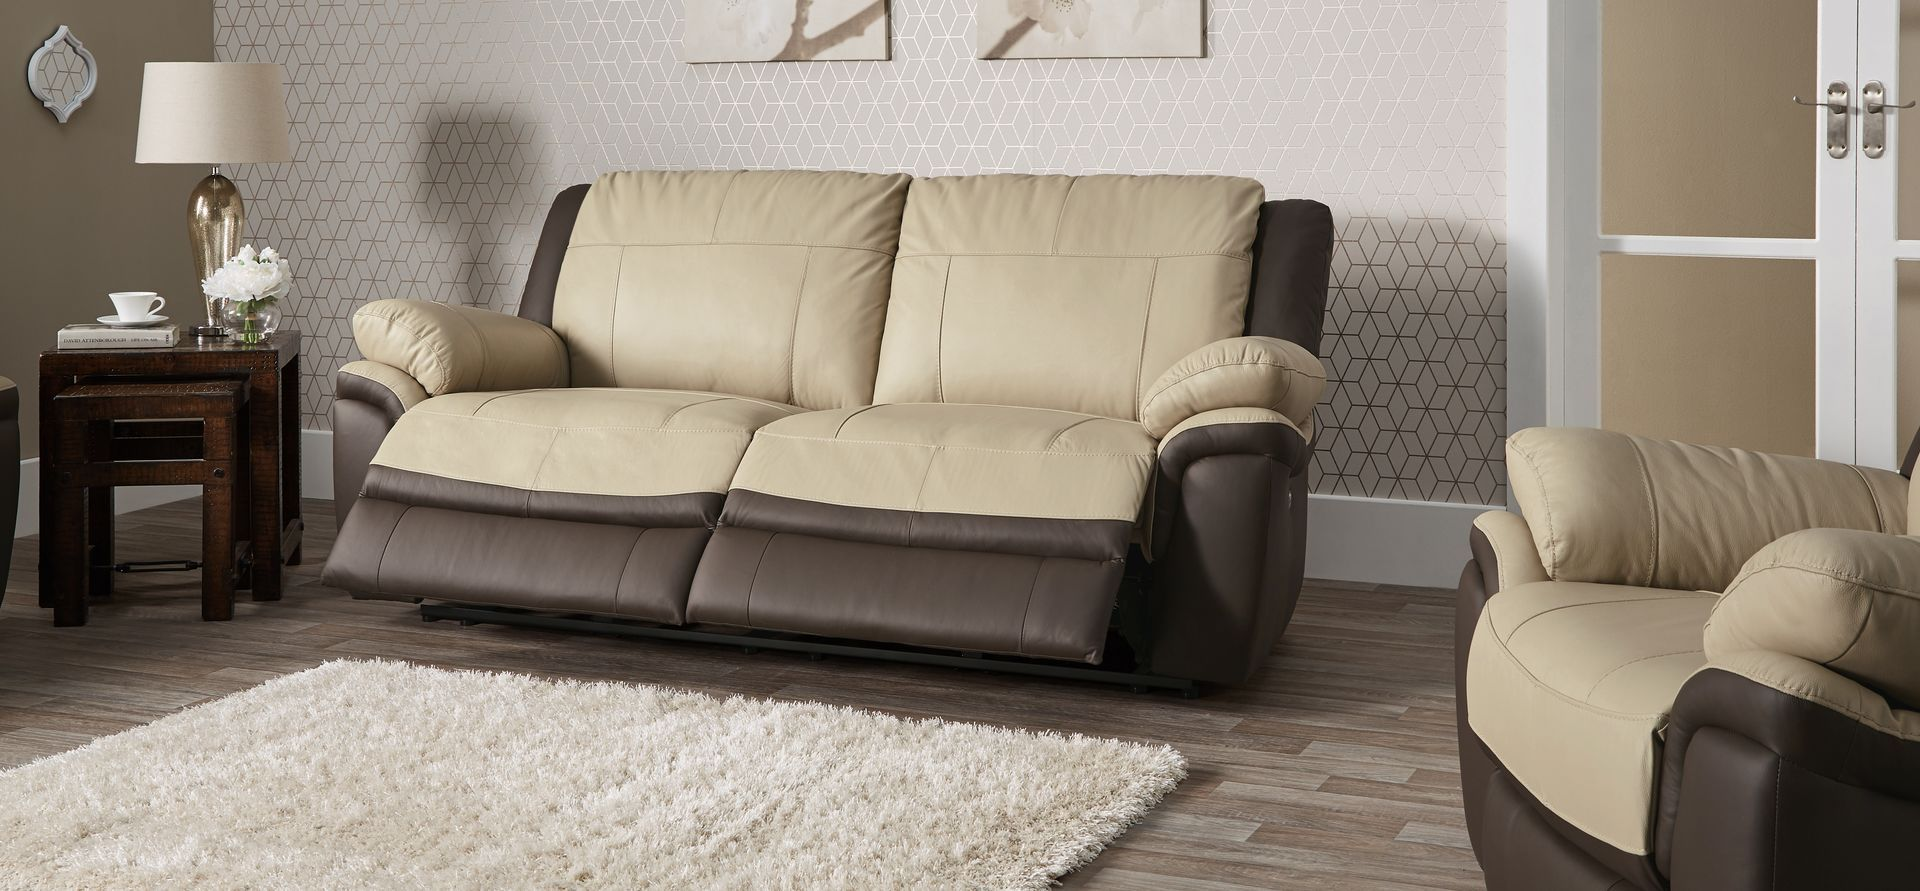 Aries 3 Seater Manual Recliner Sofa Scs Reclining Sofa Furniture Sofa Set Sofa